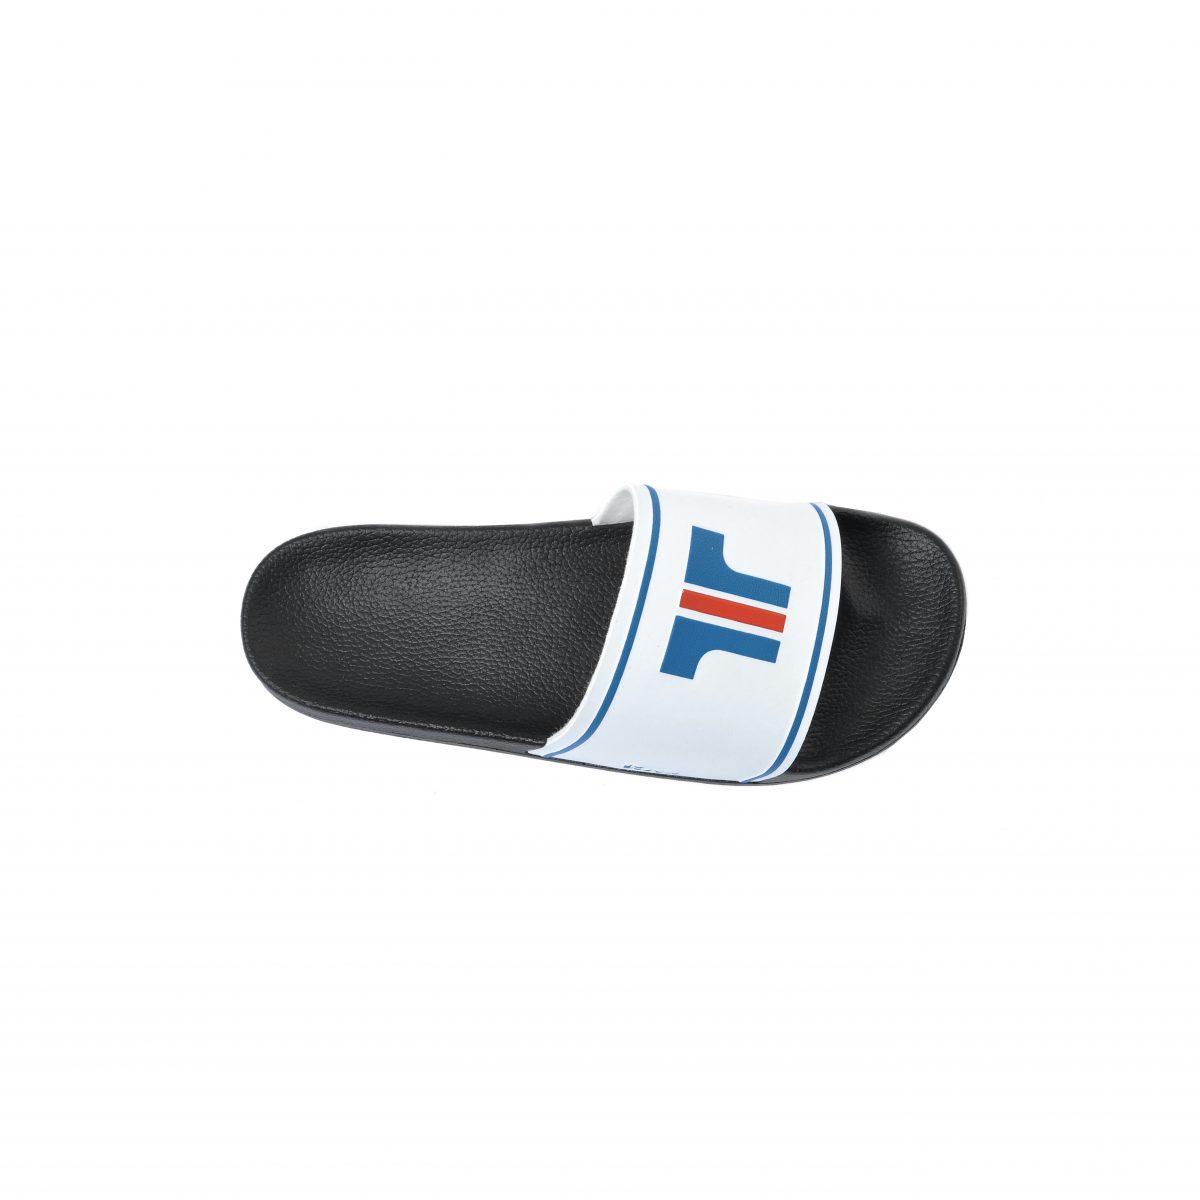 Tisza cipő - Papucs - Fekete-klasszik